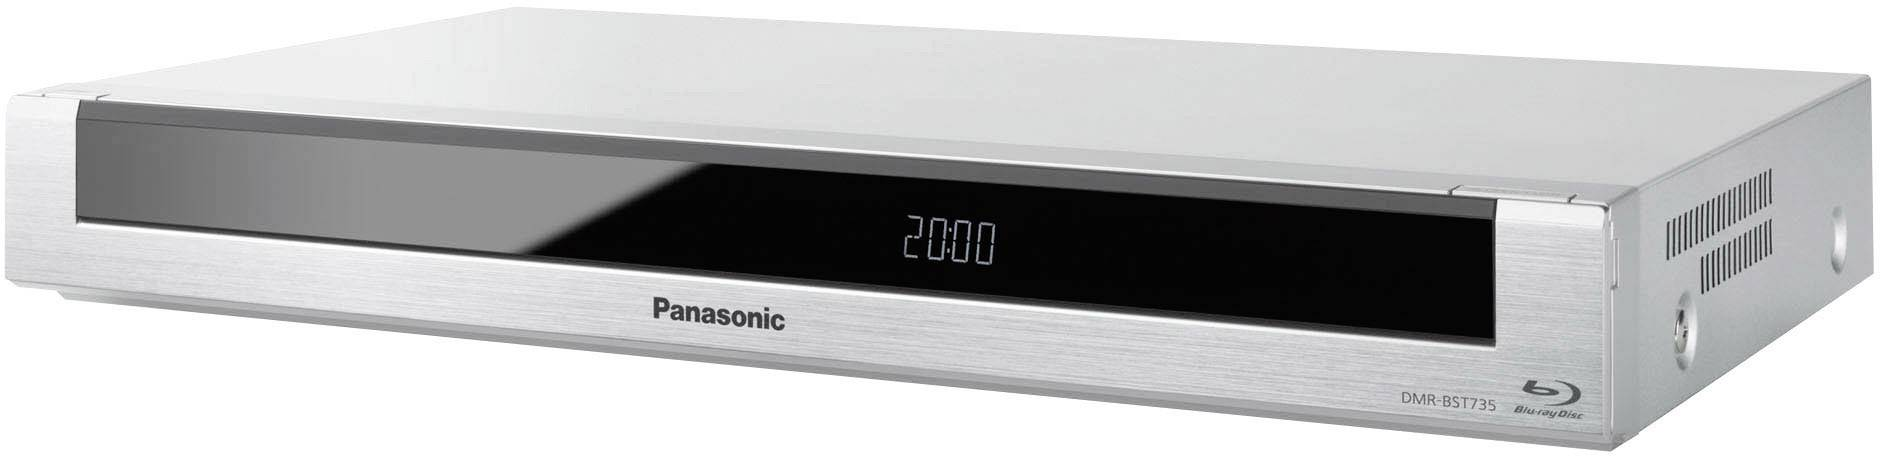 Driver: Panasonic DMR-BST735EG Recorder